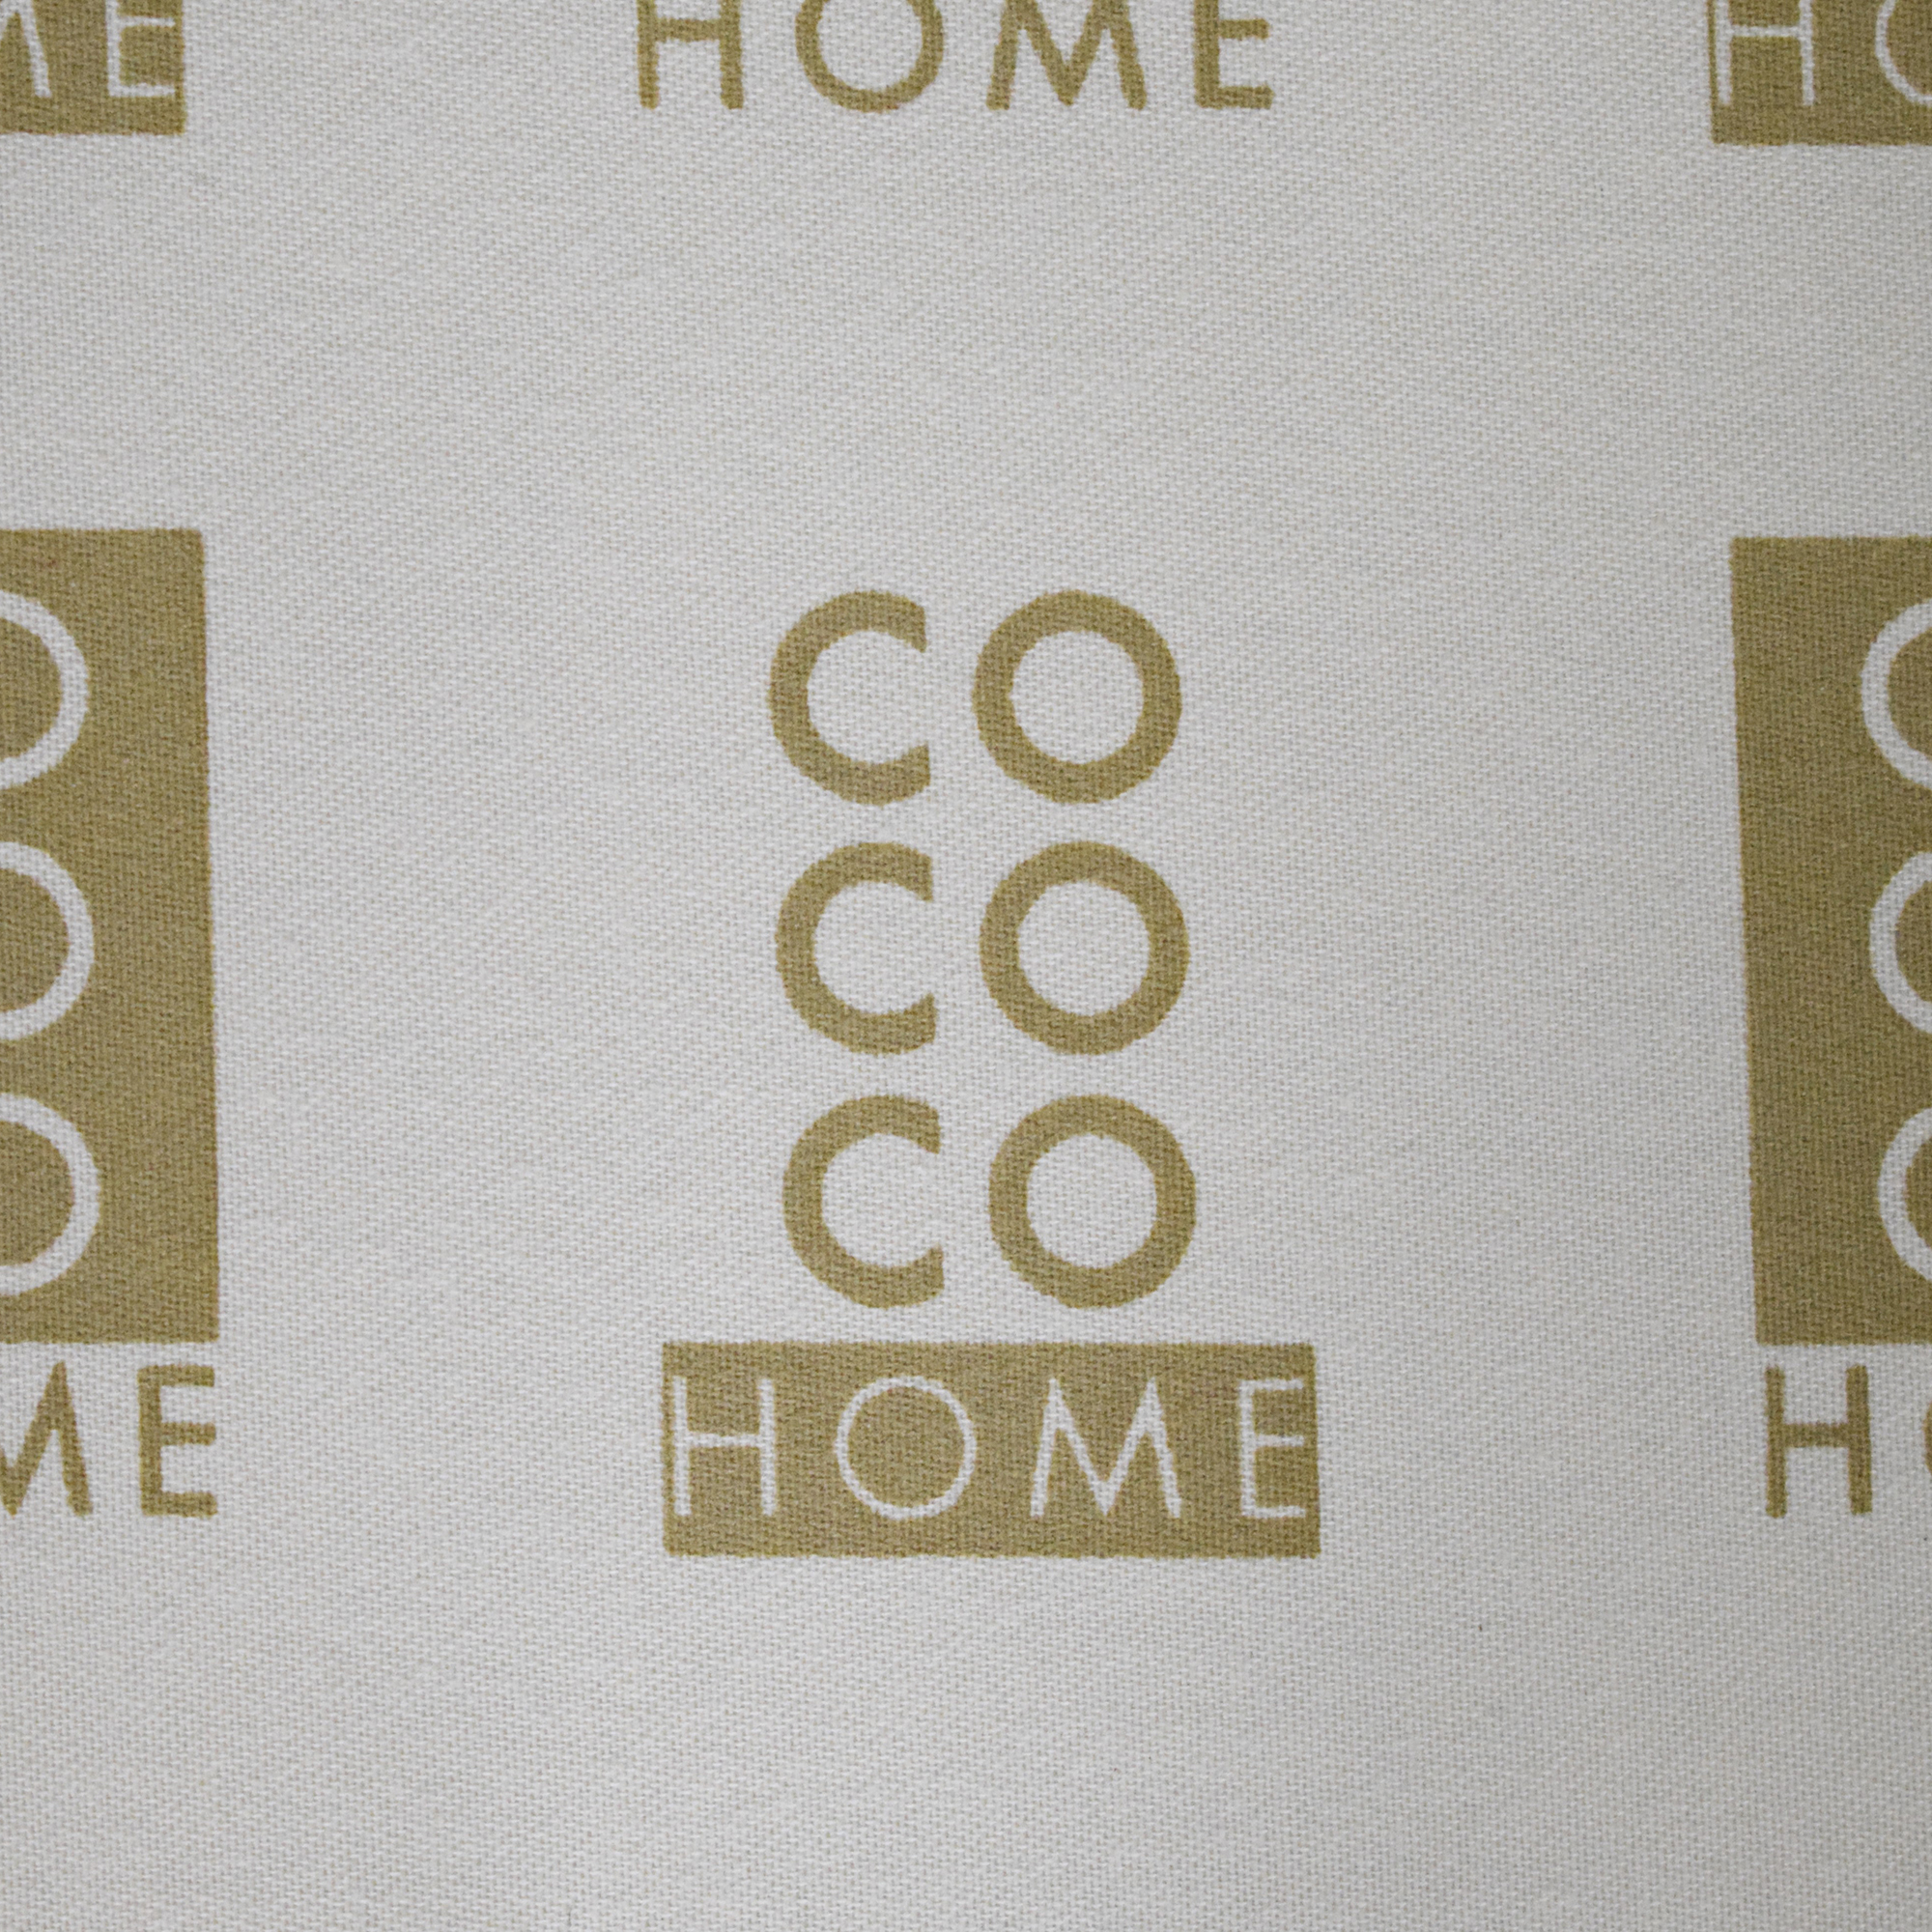 COCOCO COCOCO English Arm Tight Back Sofa teal